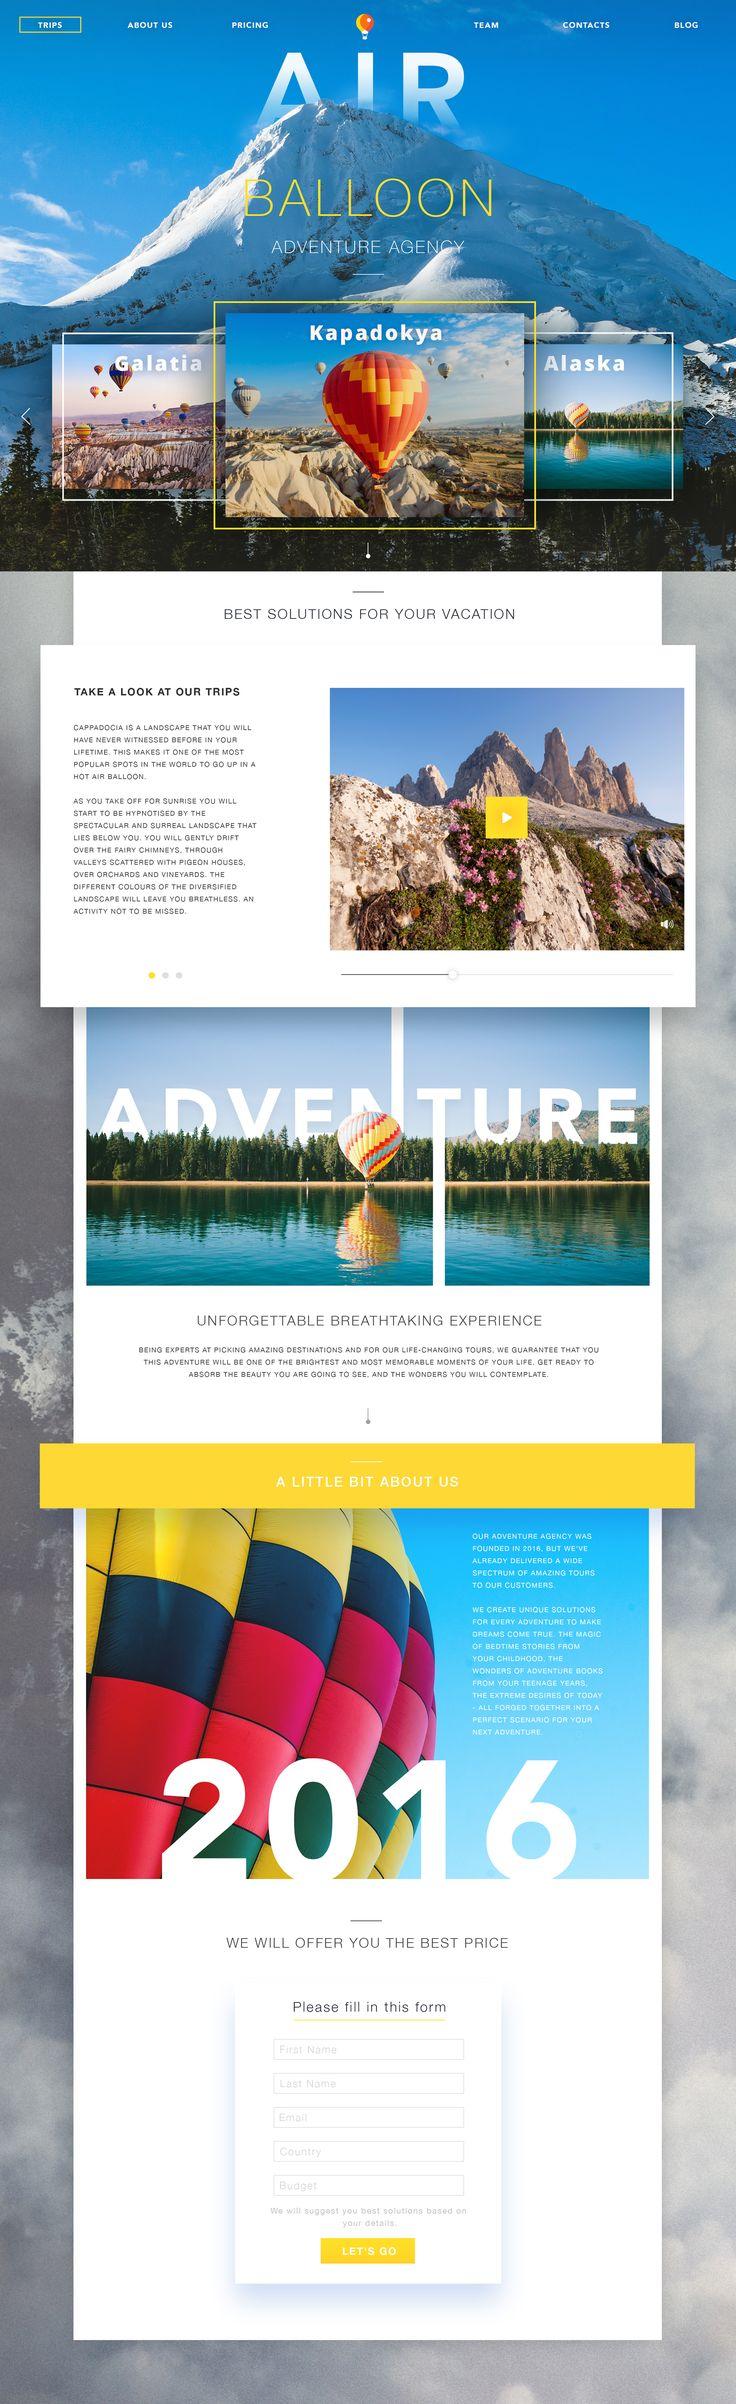 Adventure agency website tubikstudio